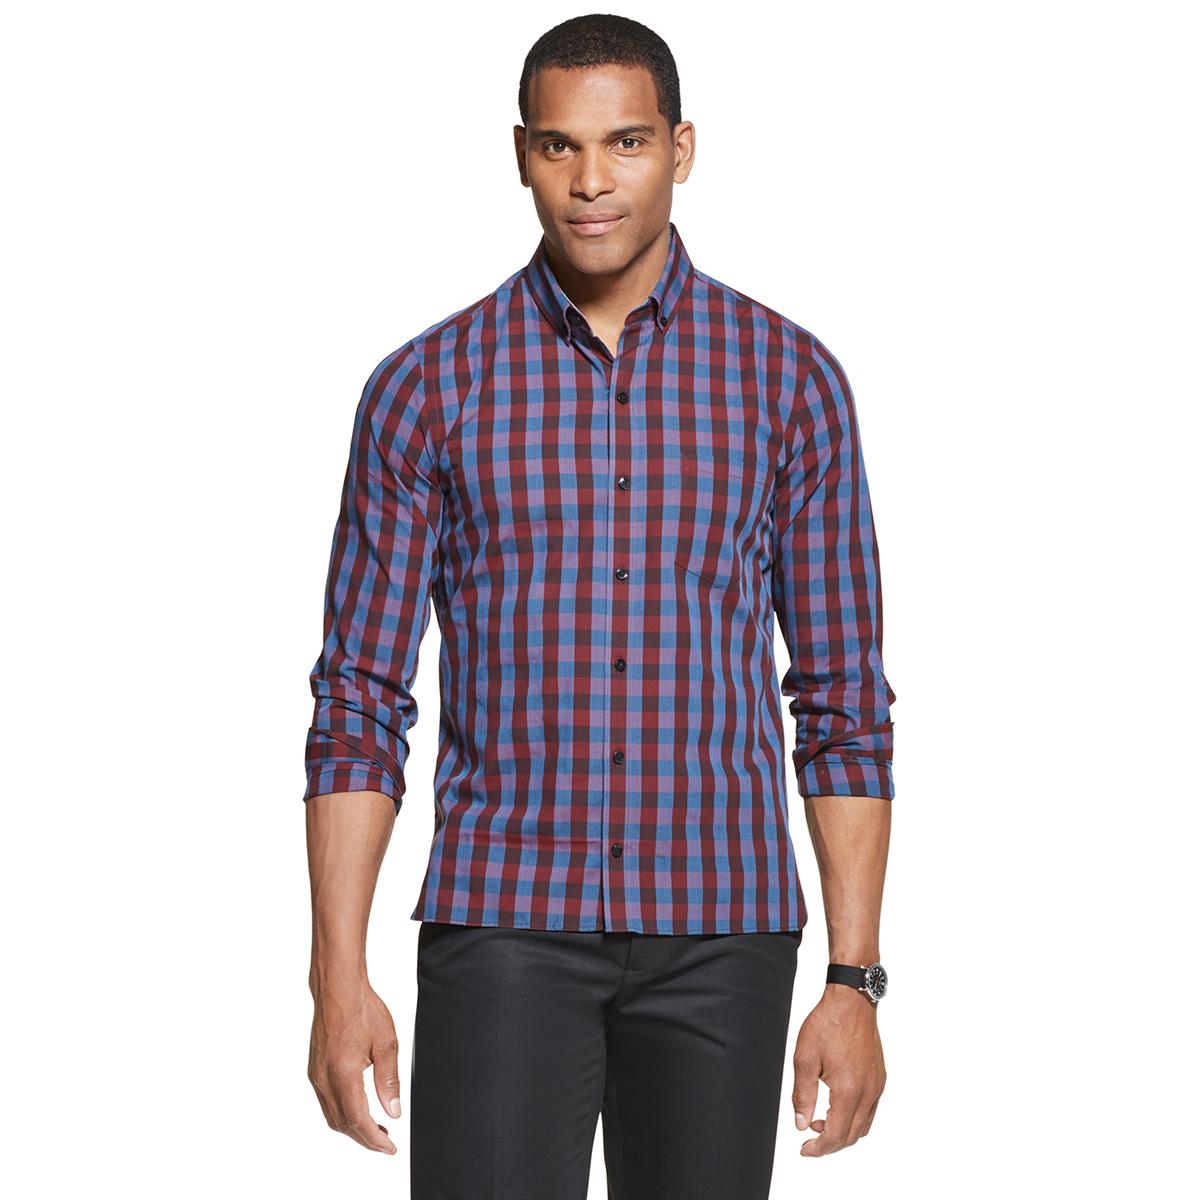 Van Heusen Men's Never Tuck Long-Sleeve Slim Fit Check Shirt - Brown, M